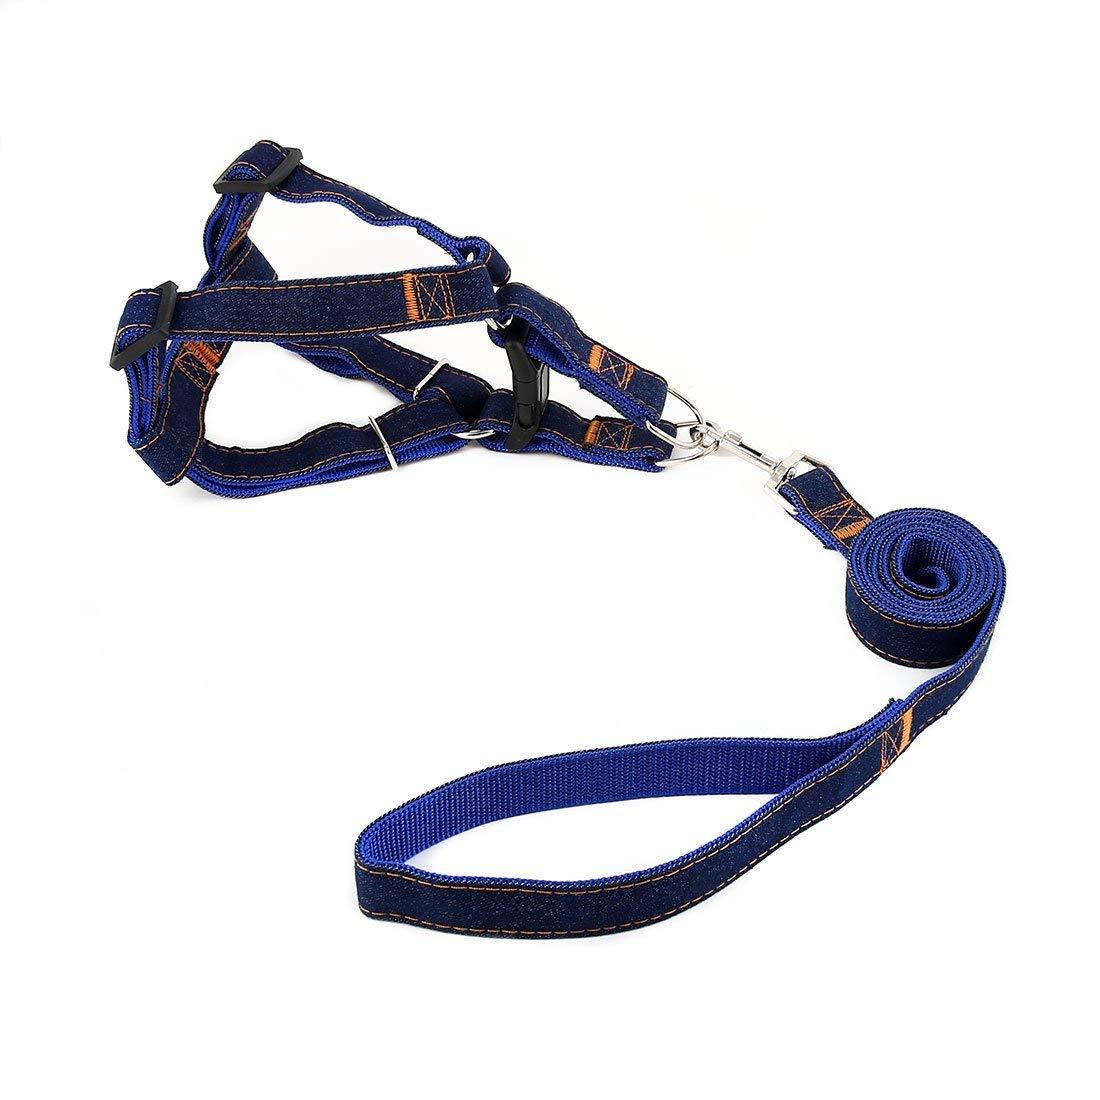 1Pc XL, bluee   Denim Pet Dog Picnic Running Adjustable Handle Leash Rope Chest Harness